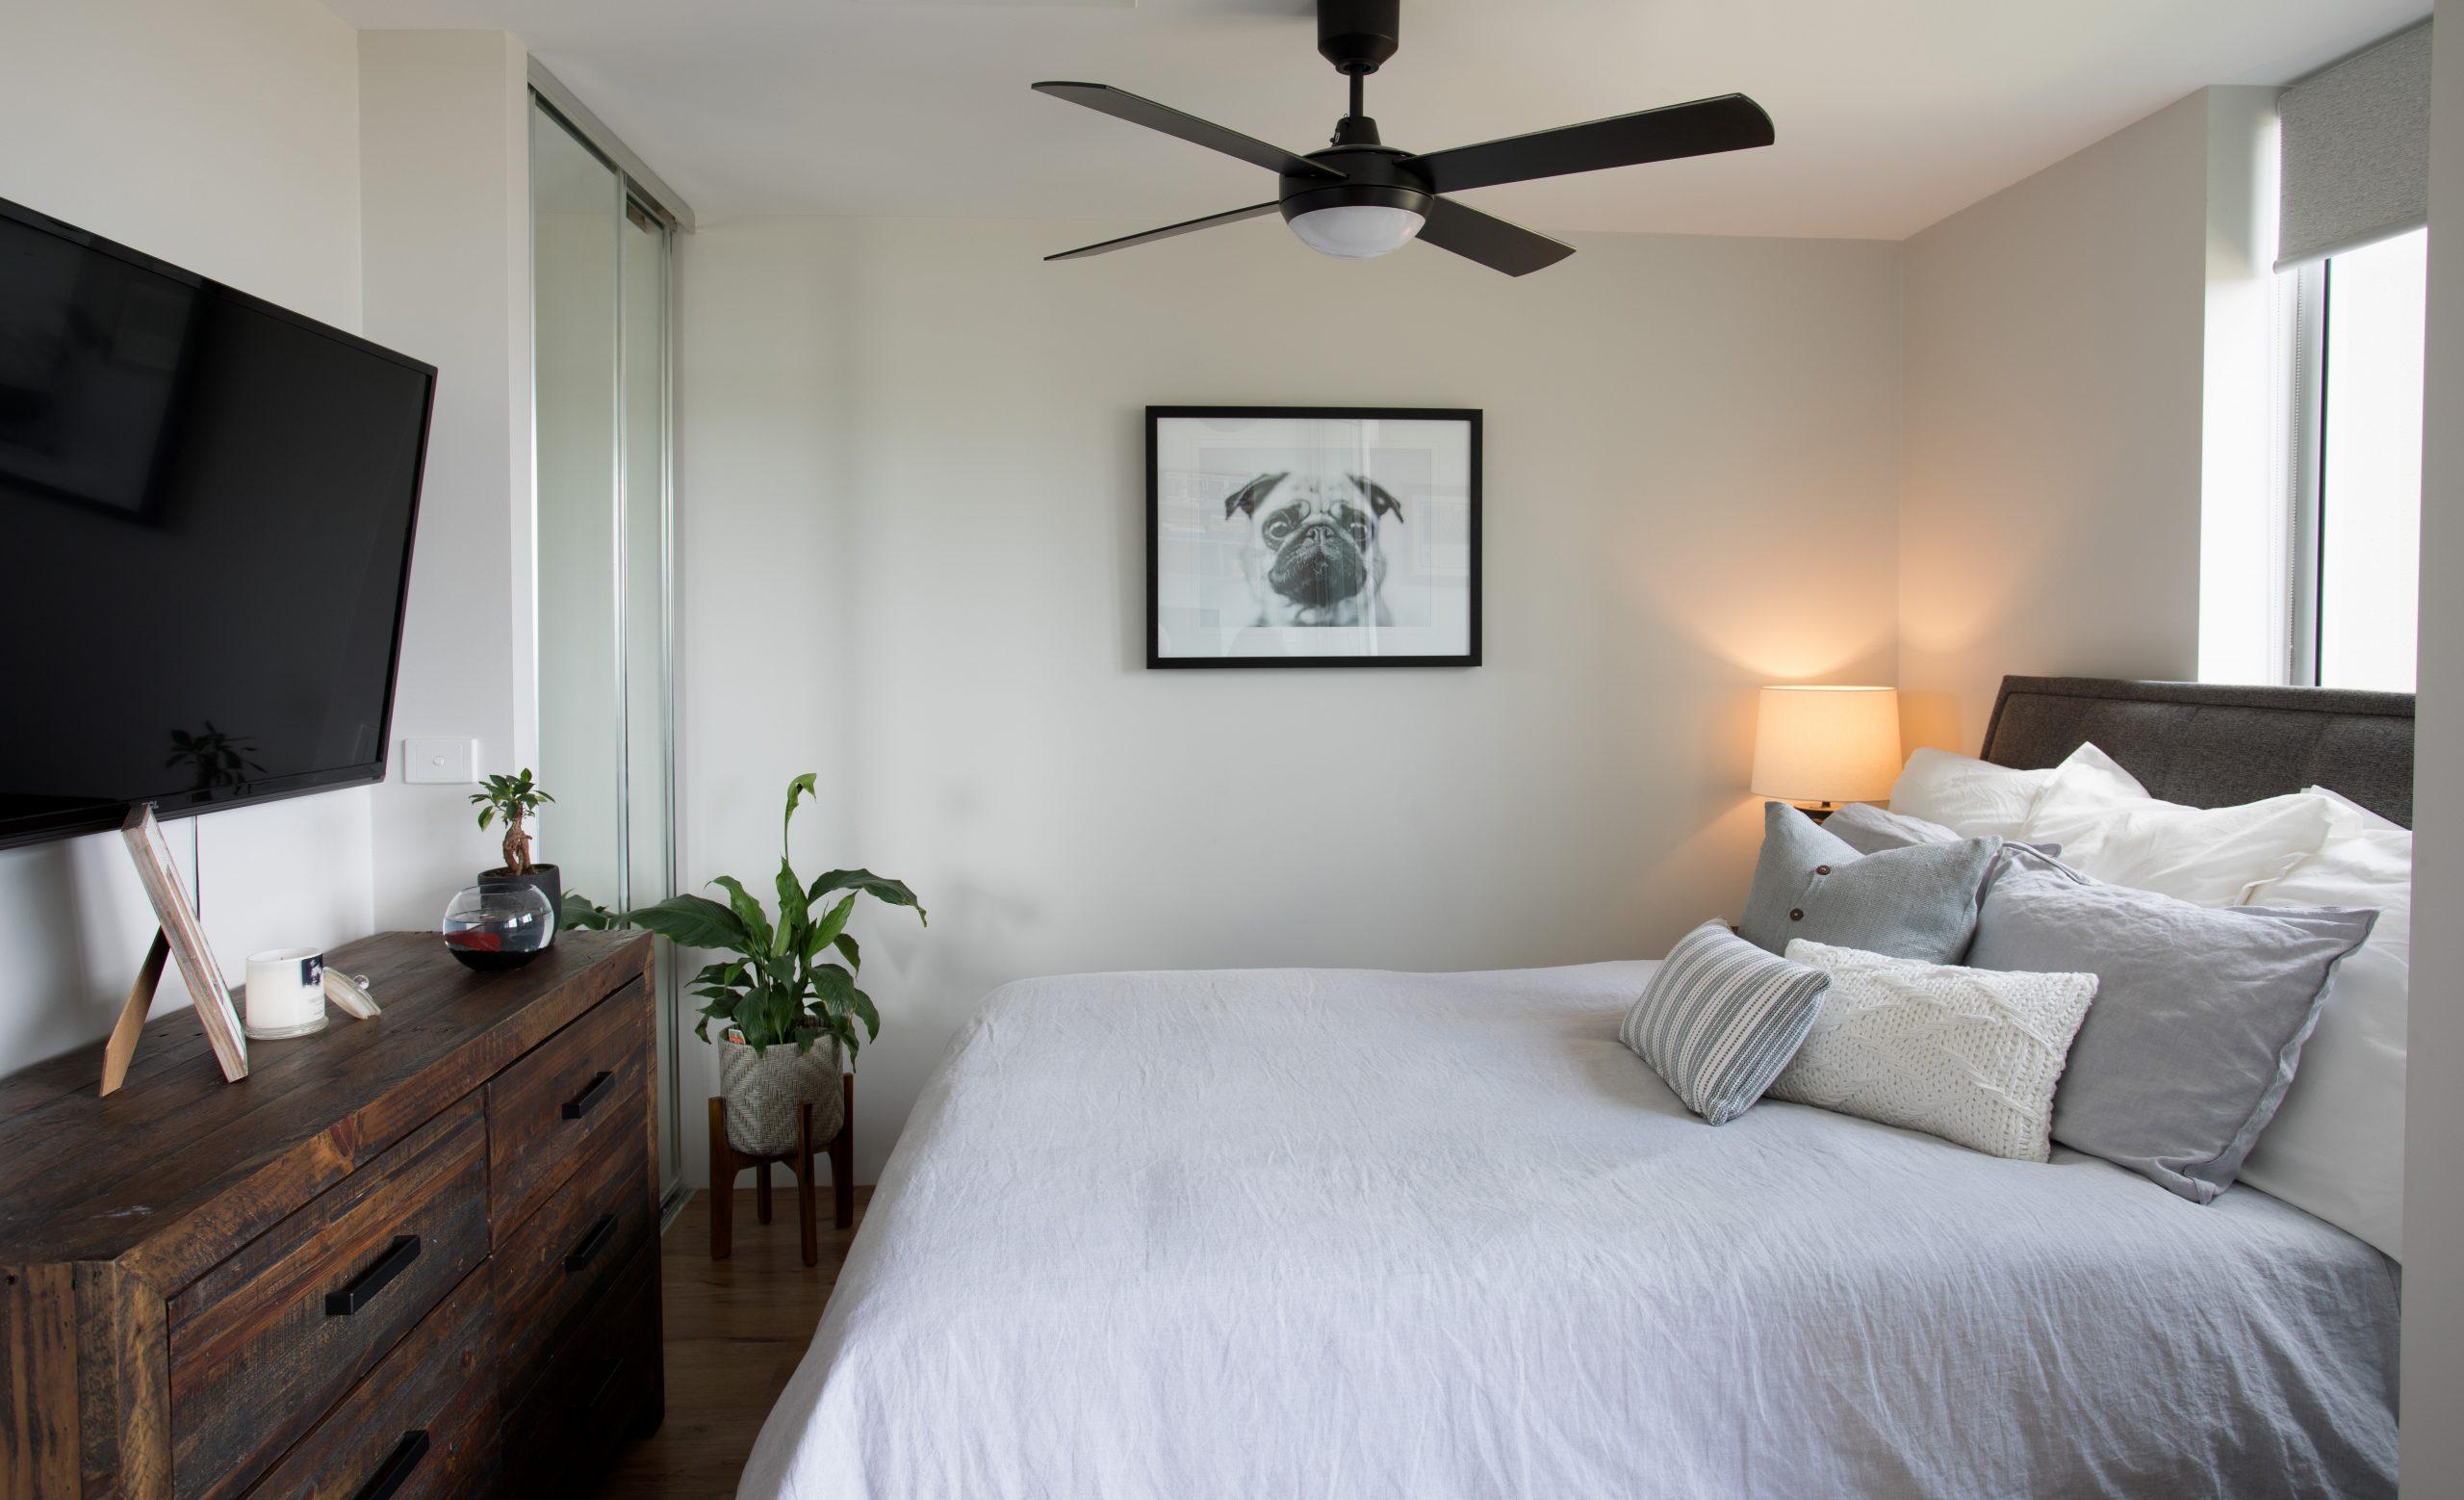 https://www.ivyandfinch.com.au/wp-content/uploads/2021/02/Roma-Street-Parklands-Interior-Design-Guest-Room-scaled.jpg